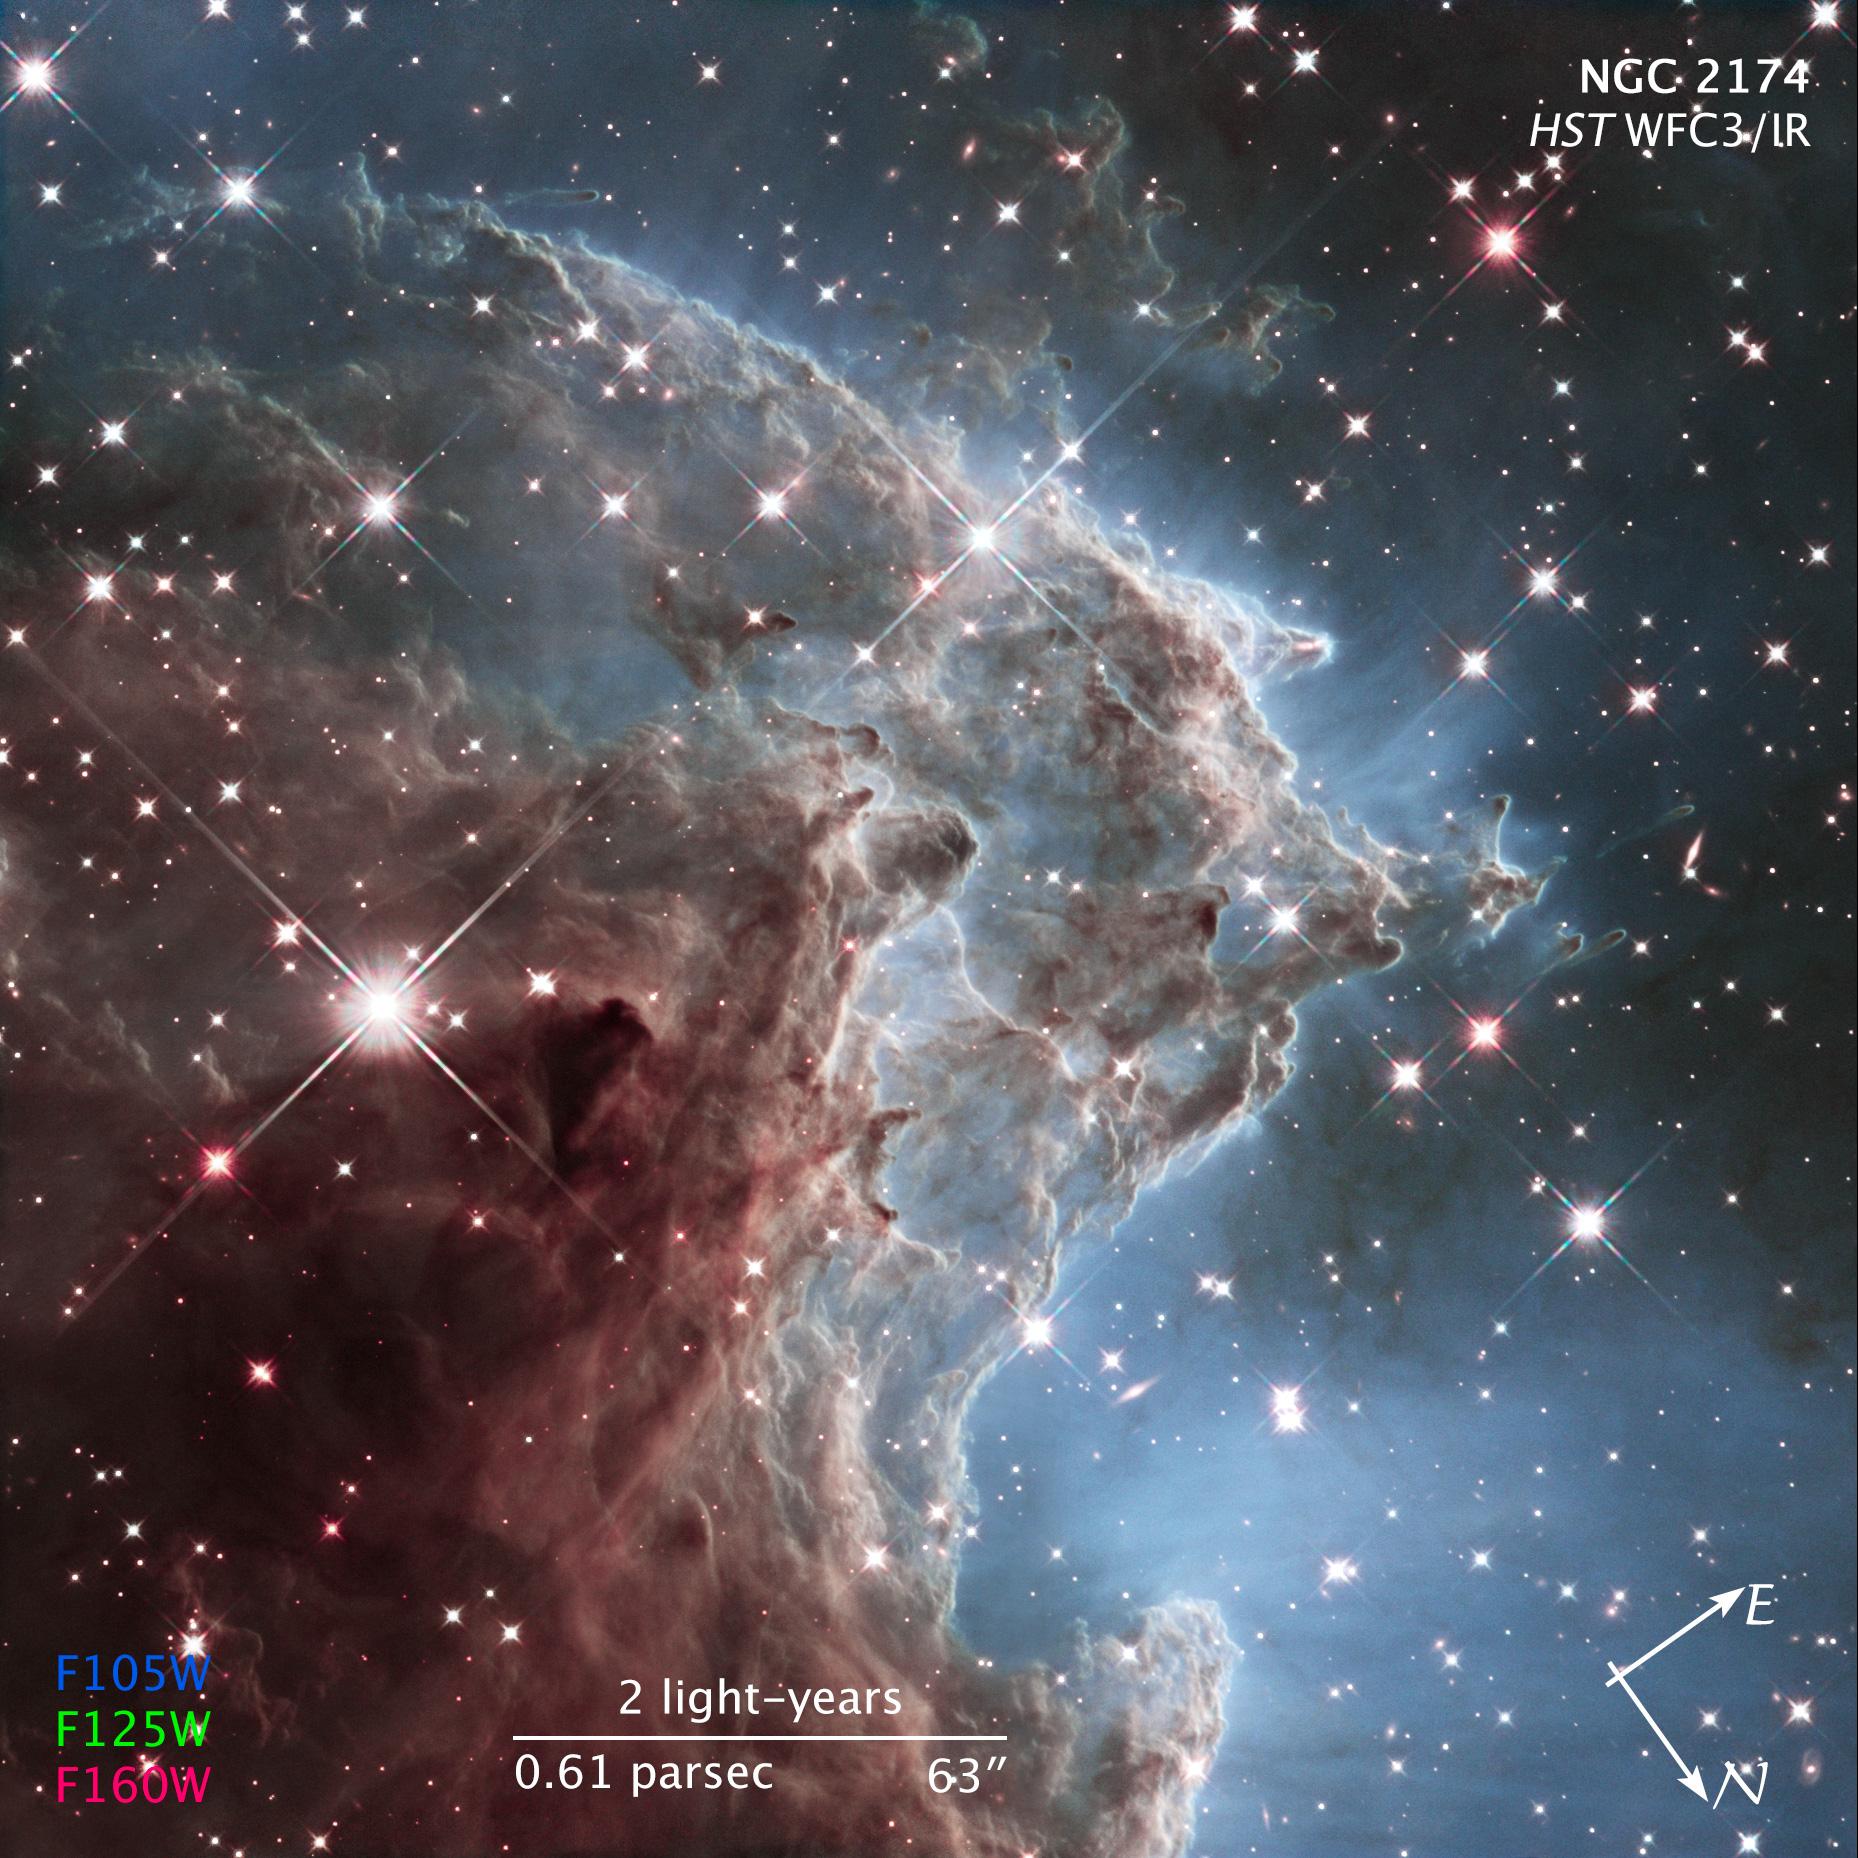 Celestial Photos: Hubble Space Telescope's Latest Cosmic Views